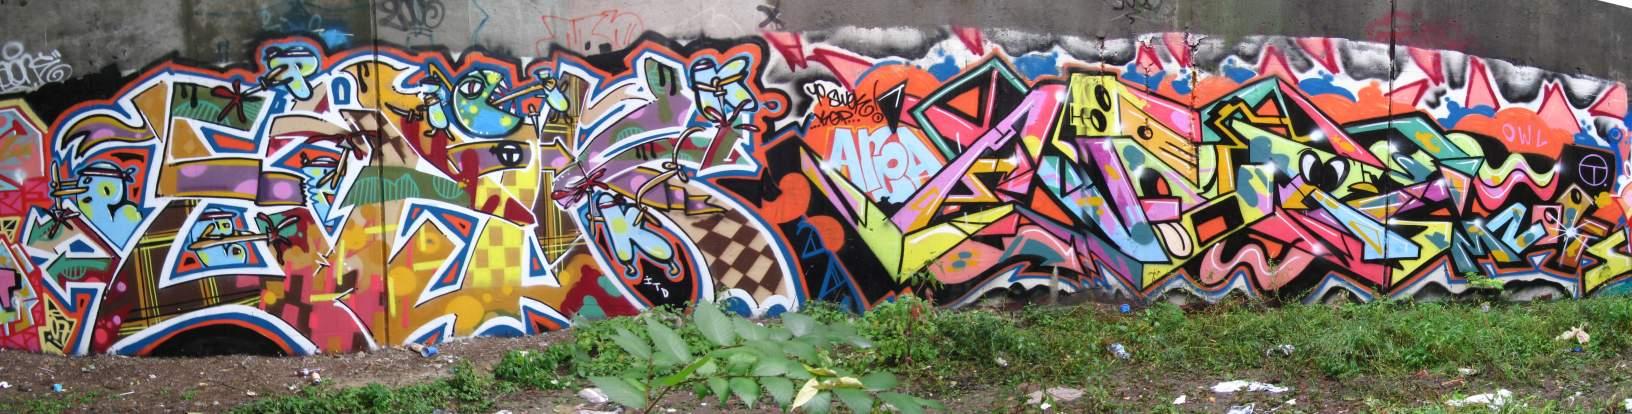 graf460946.jpg